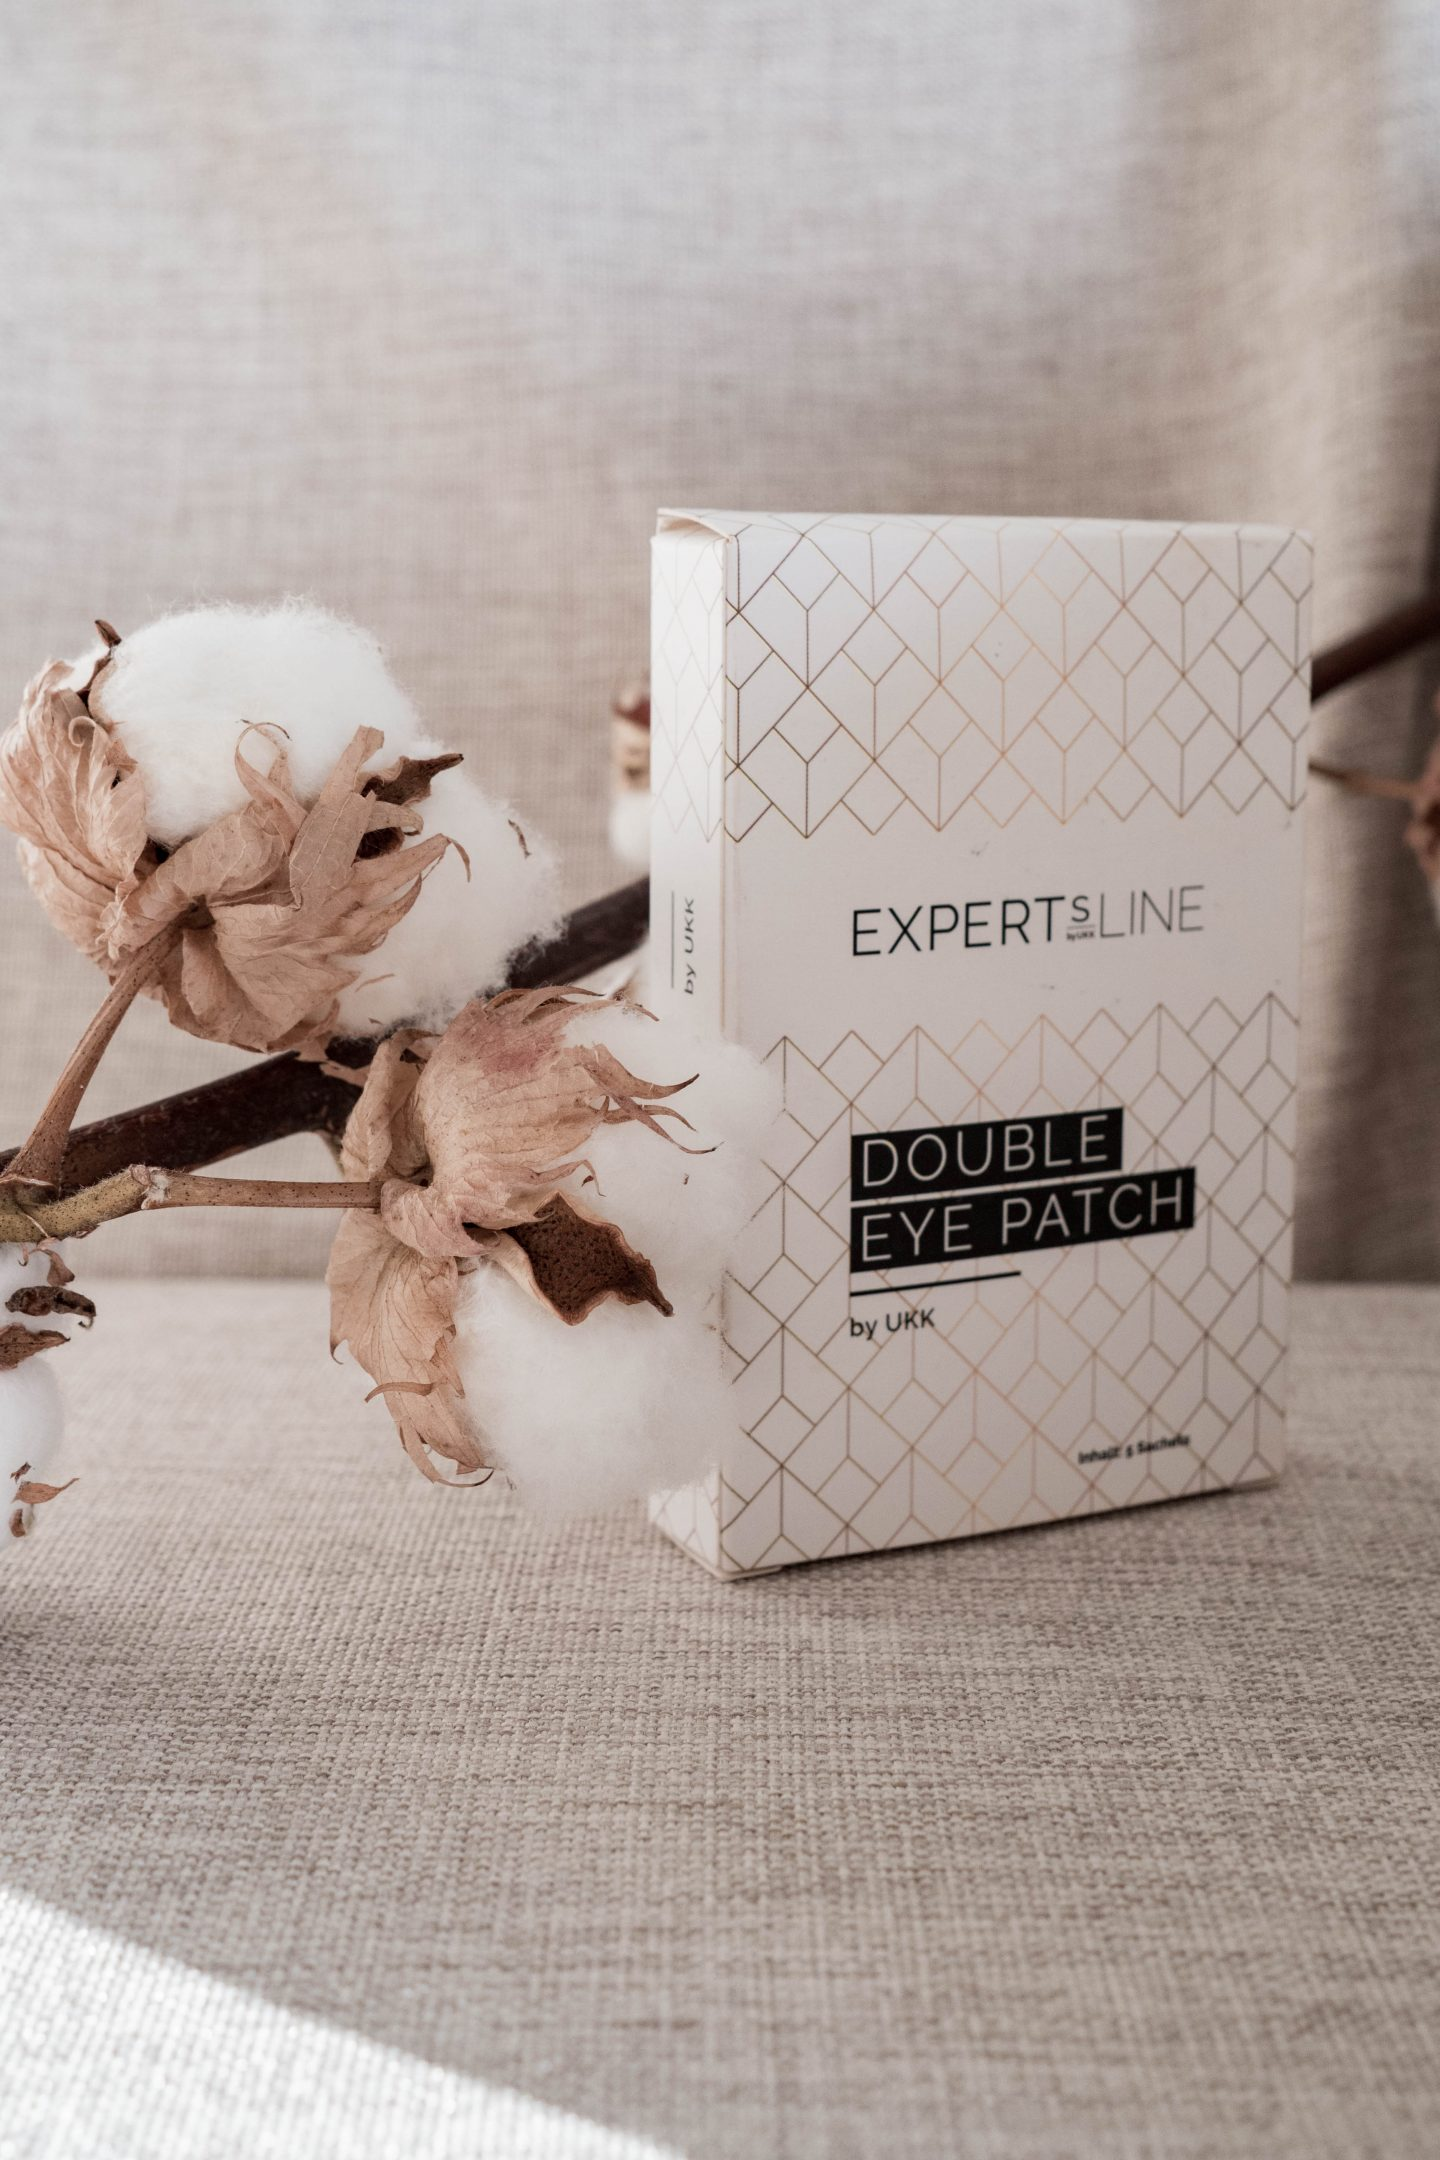 Beautyblog - ExpertsLine - Veralice - Double Eye Patch Augenmaske - beste Anti-Aging Produkte - beste Inhaltsstoffe - Hyaluron - AHA - Argireline - Beta Glucan - Nowshine